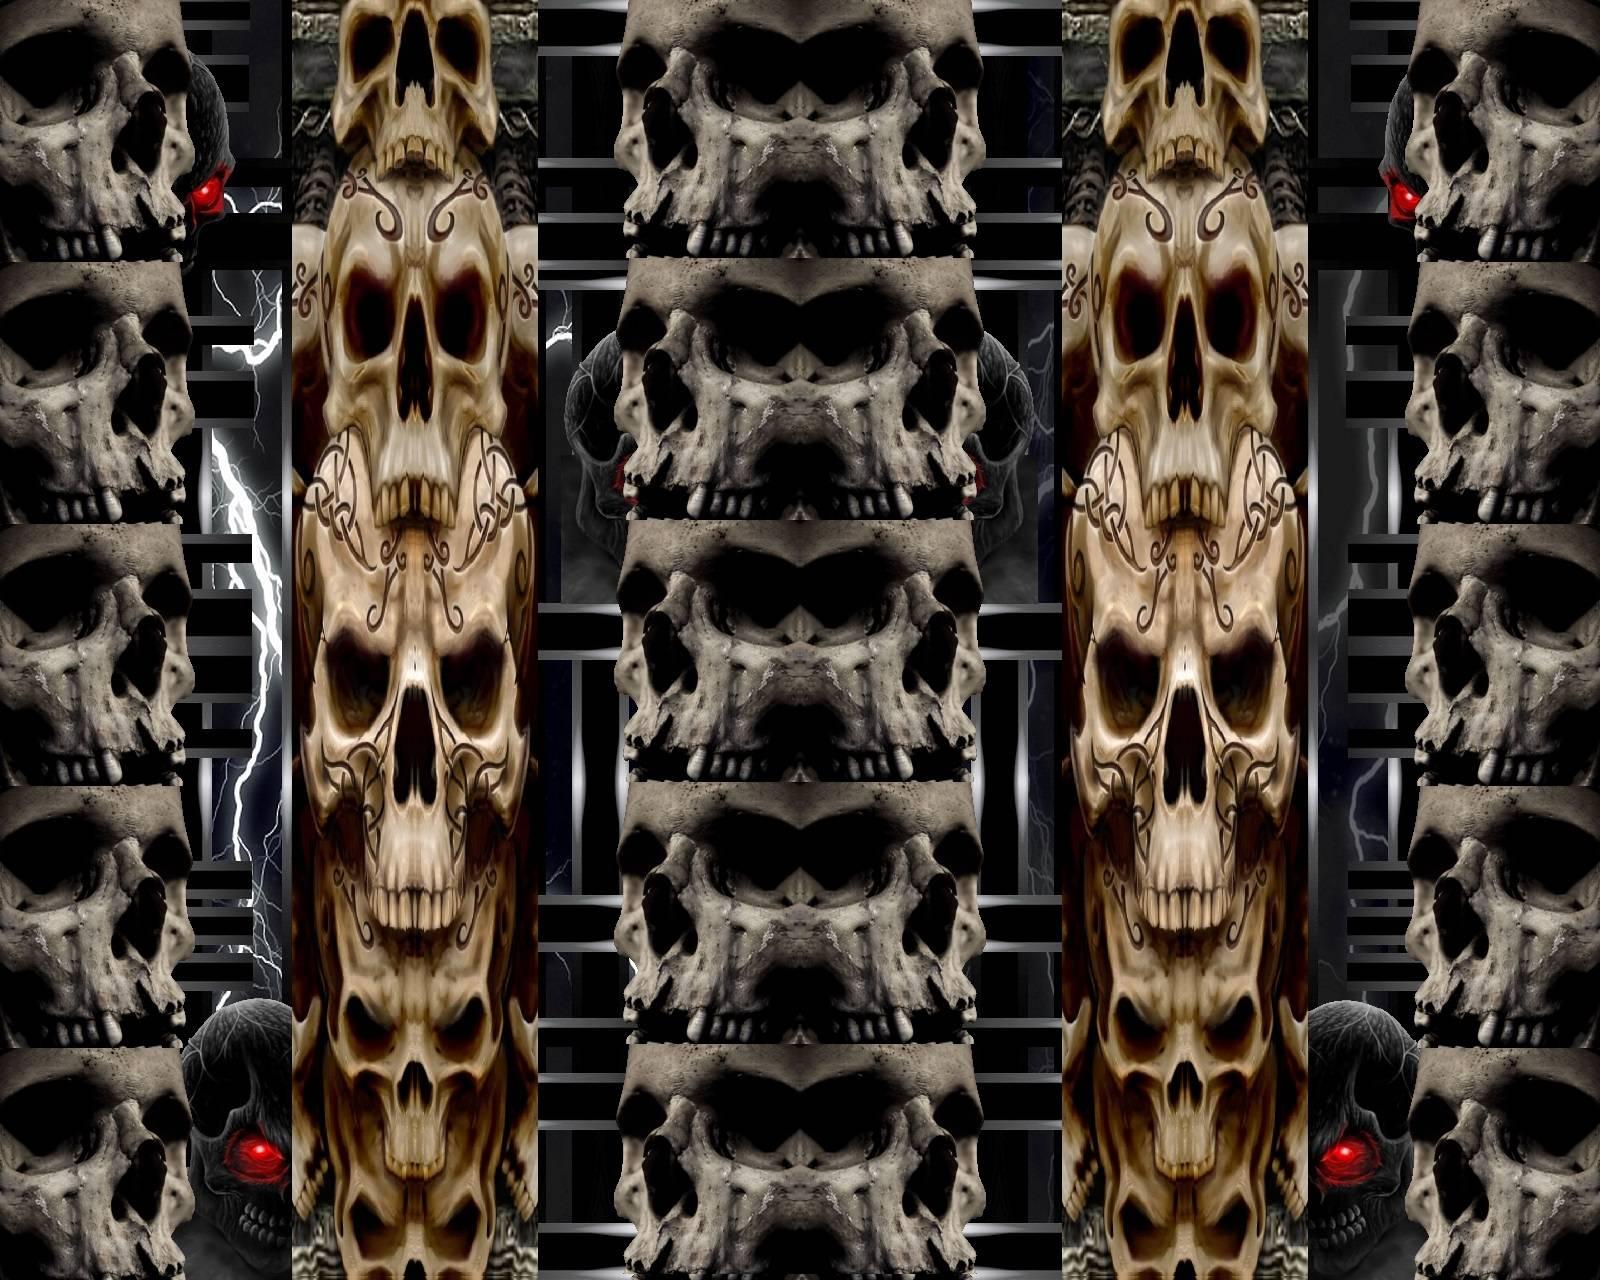 Totem Skulls